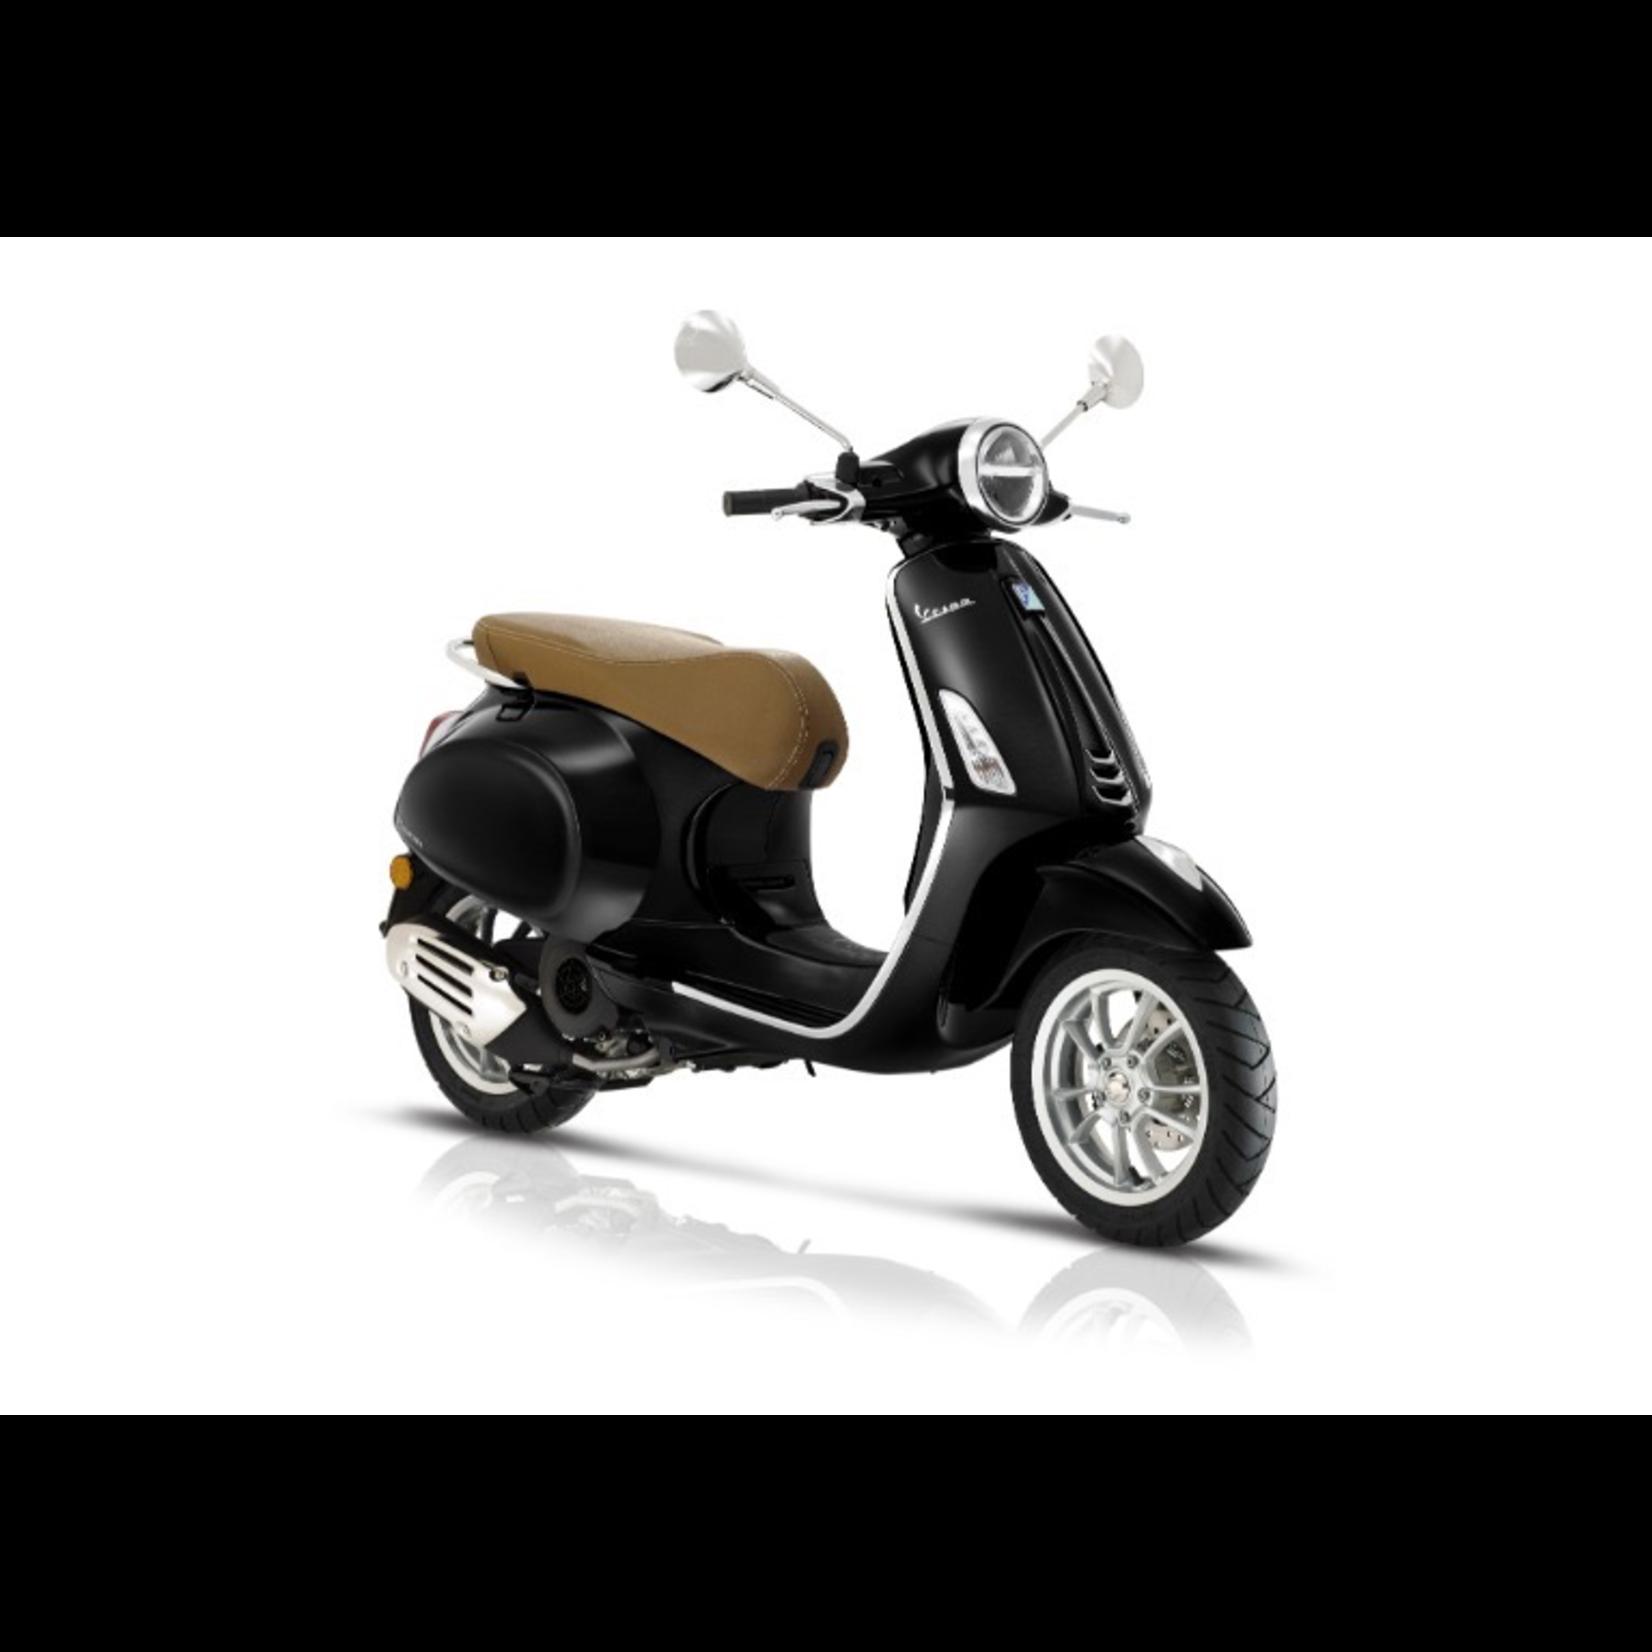 Vehicles Vespa, 2019 Primavera iGET 155cc ABS Black